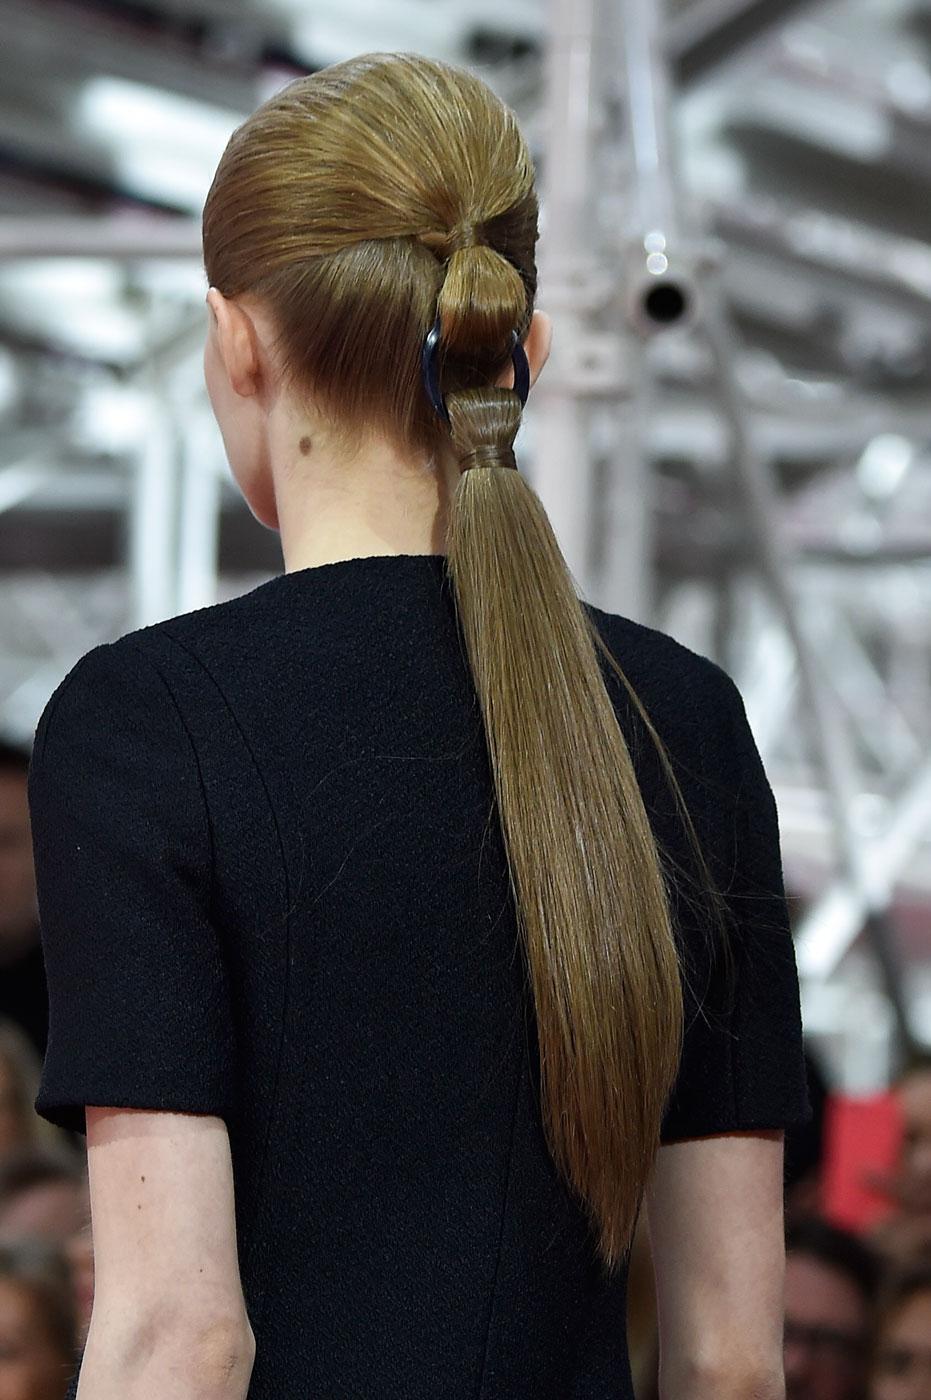 Christian-Dior-fashion-runway-show-close-ups-haute-couture-paris-spring-summer-2015-the-impression-034